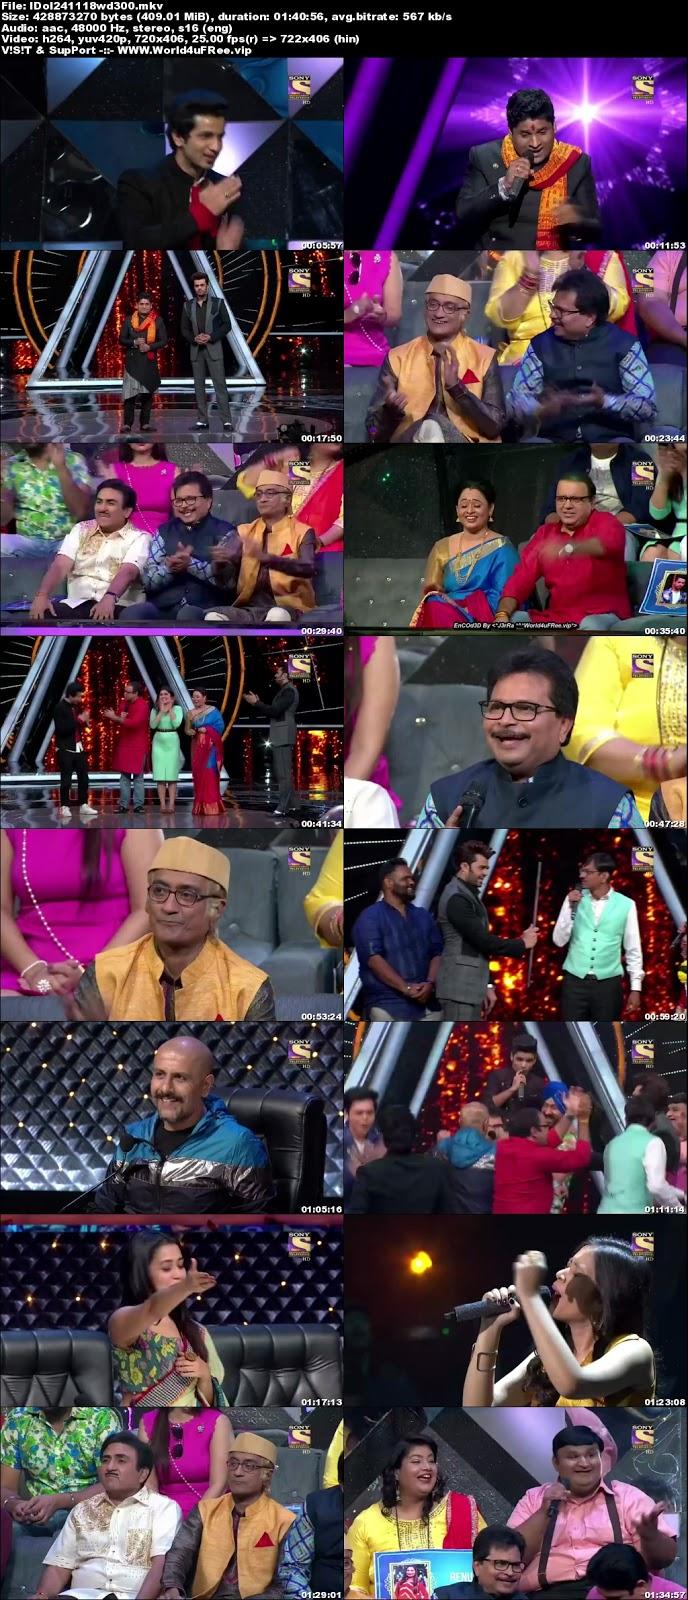 Indian Idol Season 10 24 November 2018 WEBRip 480p 300Mb world4ufree.fun tv show Indian Idol Season 10 hindi tv show Indian Idol Season 10 Sony Set tv show compressed small size free download or watch online at world4ufree.fun